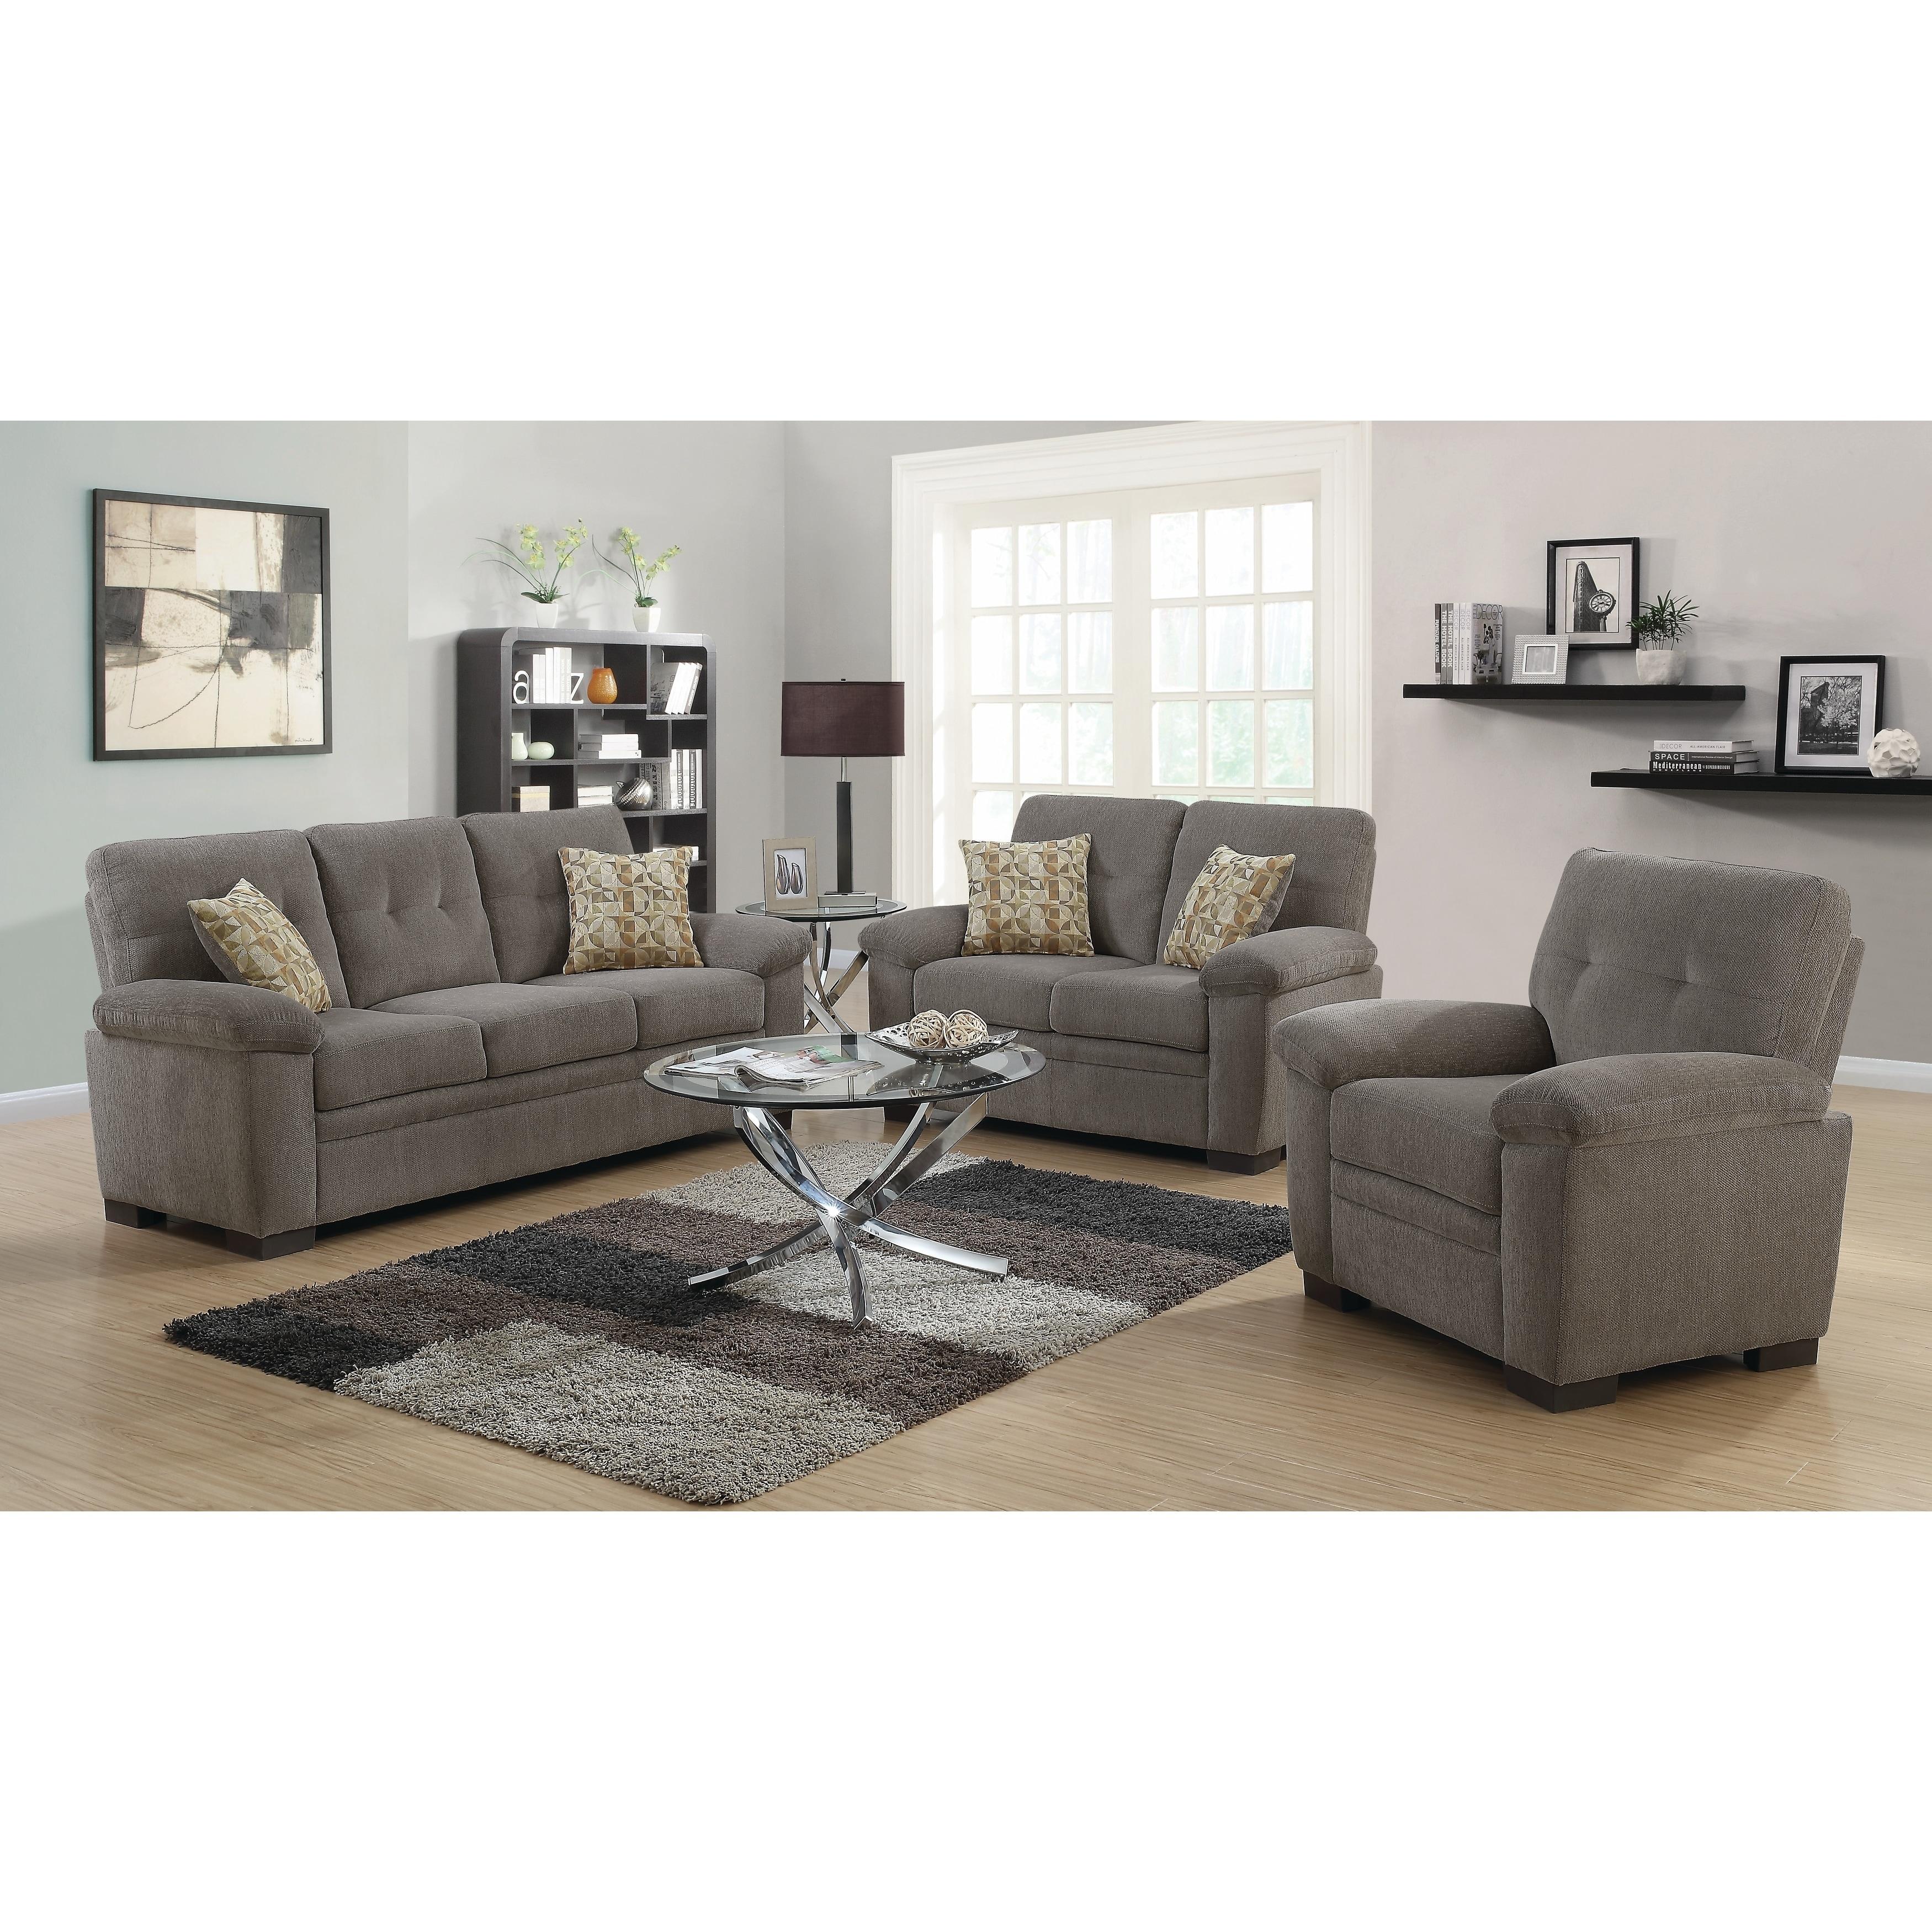 Shop fairbairn casual 3 piece living room set free shipping today overstock com 21862530